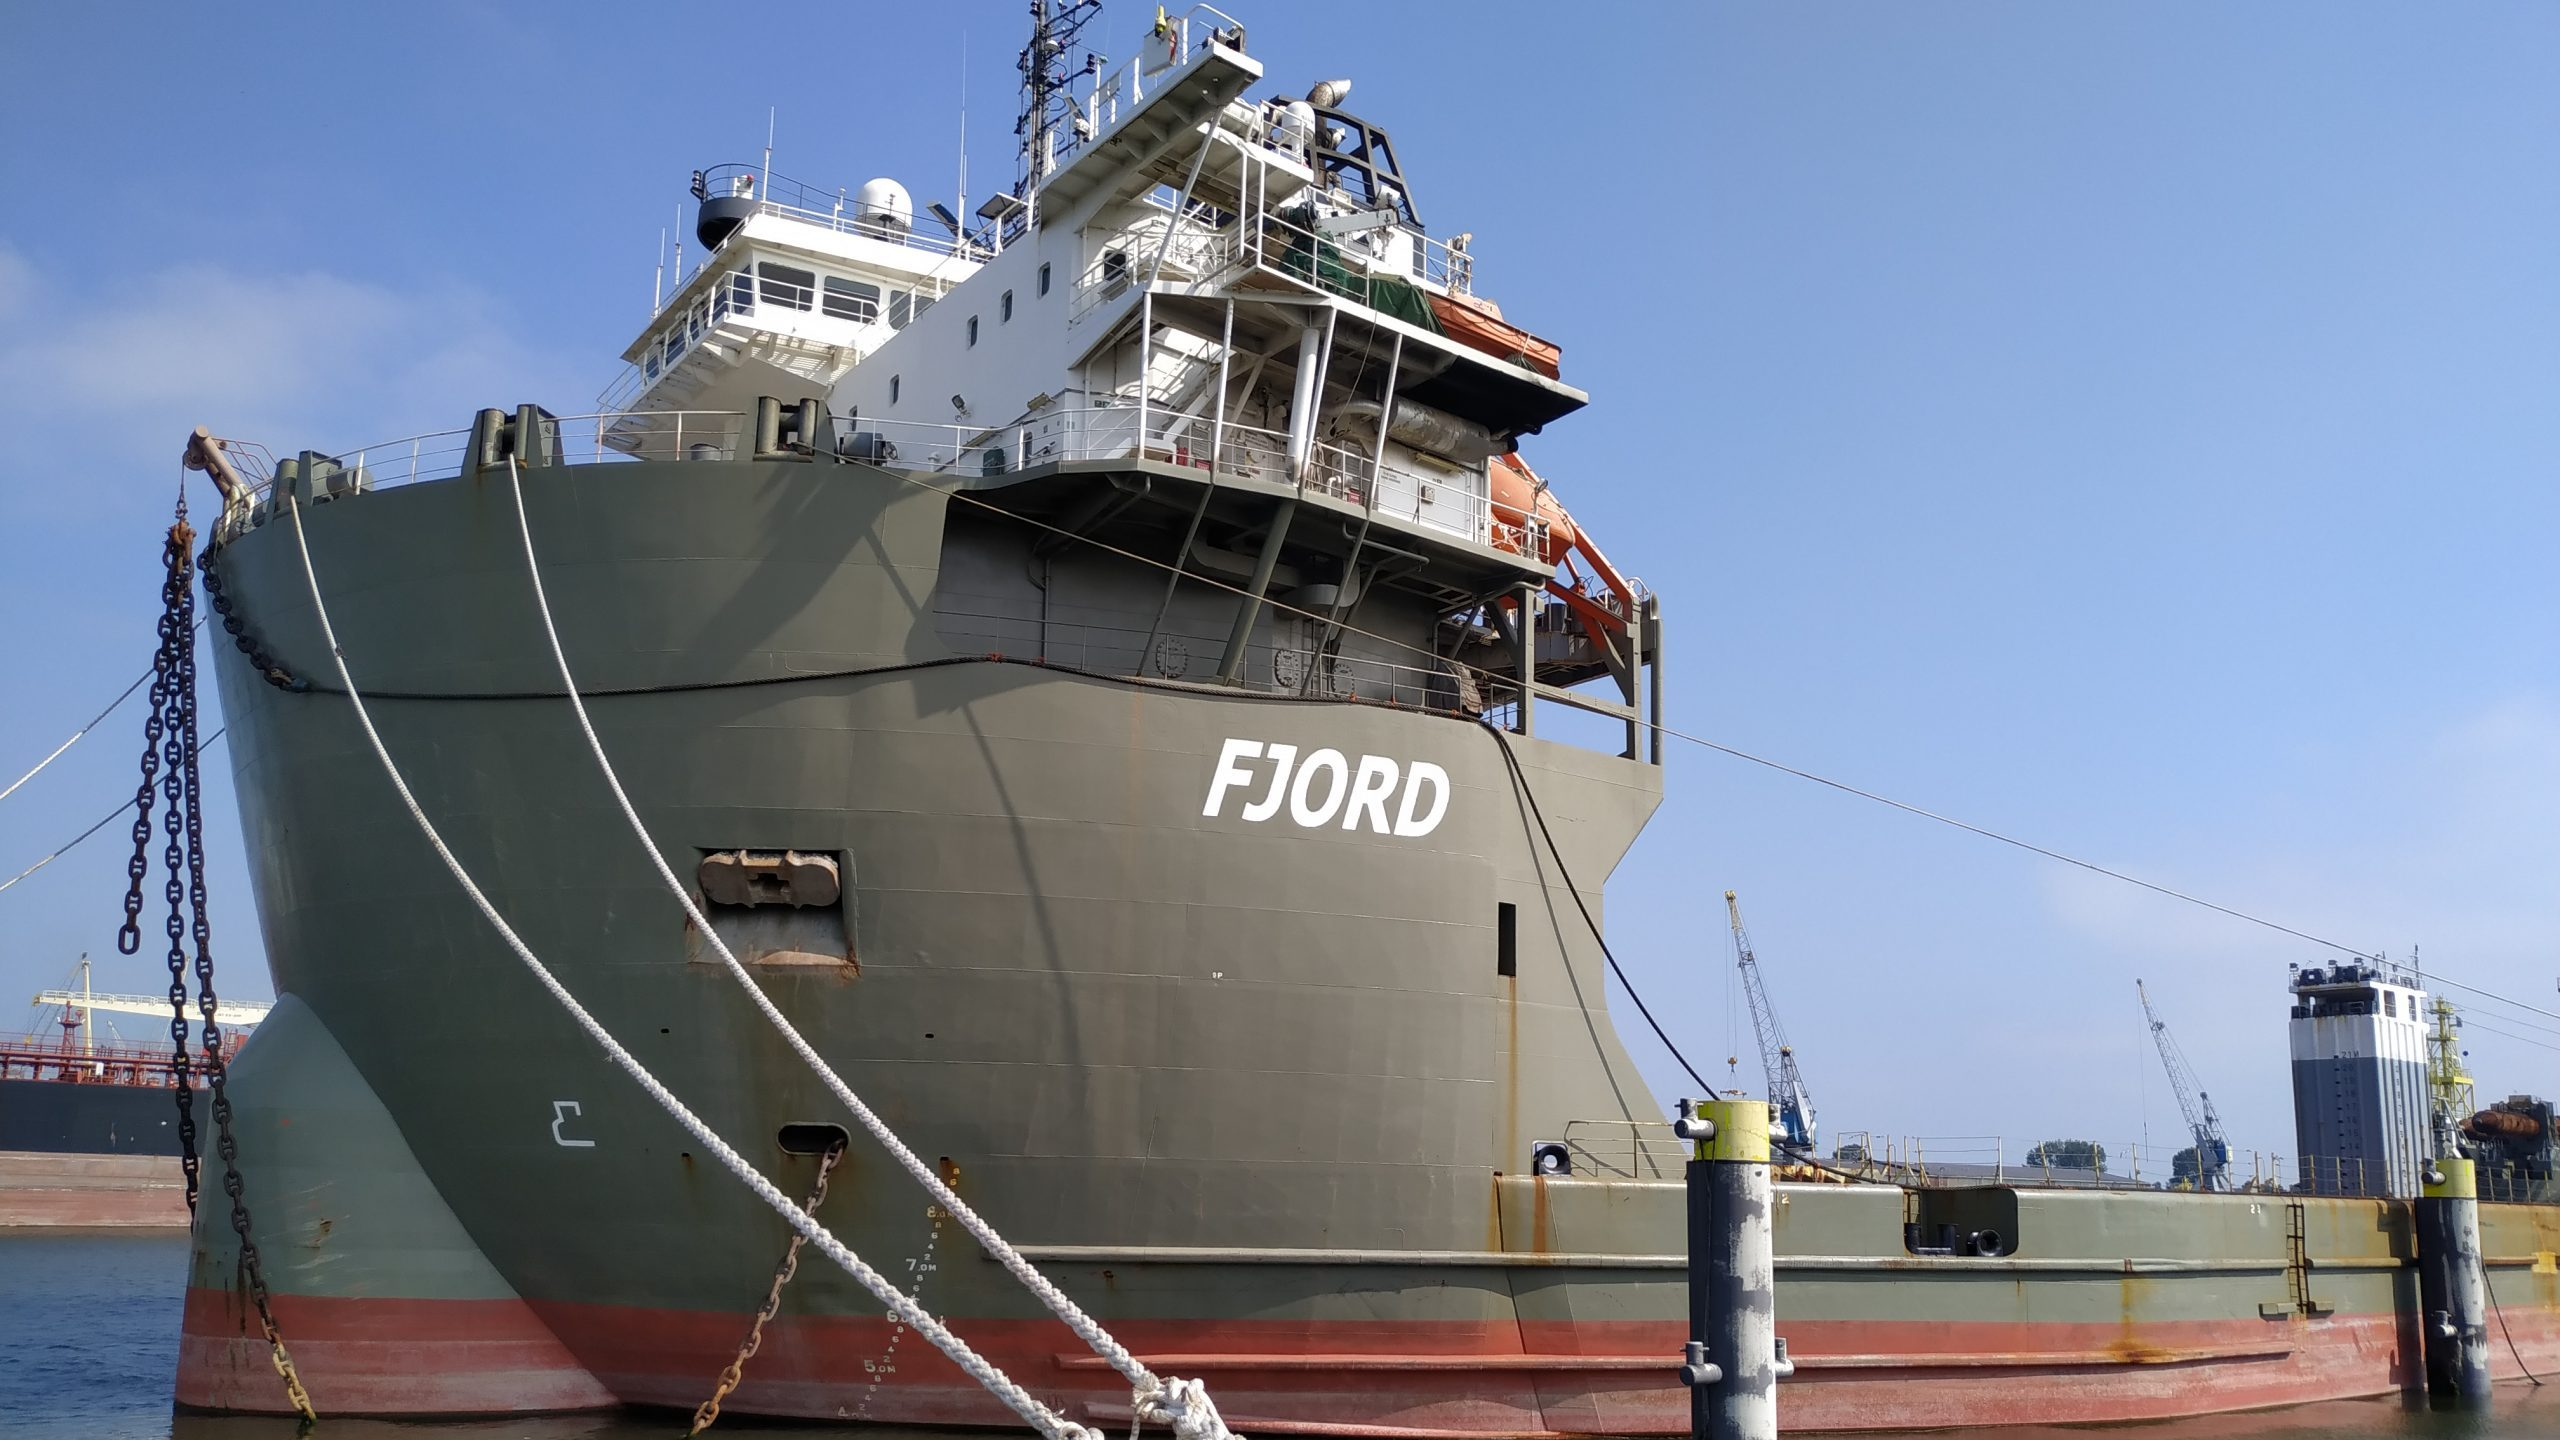 'Fjord'